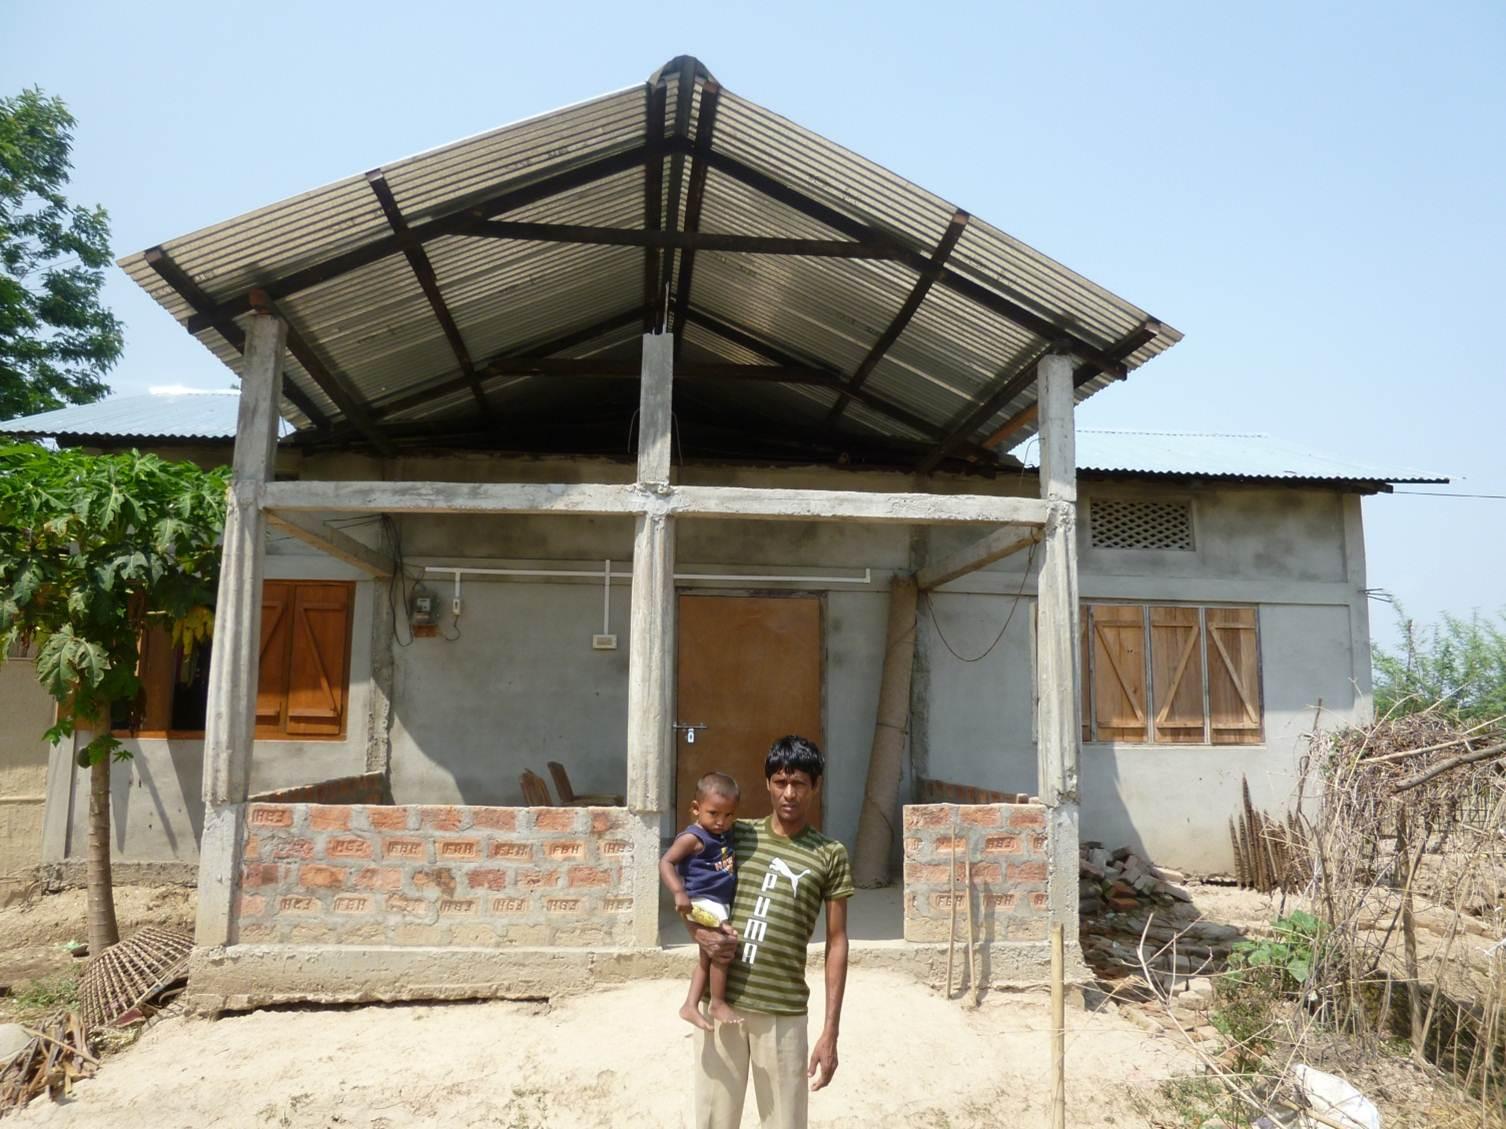 Homes for the homeless (Assam, India)